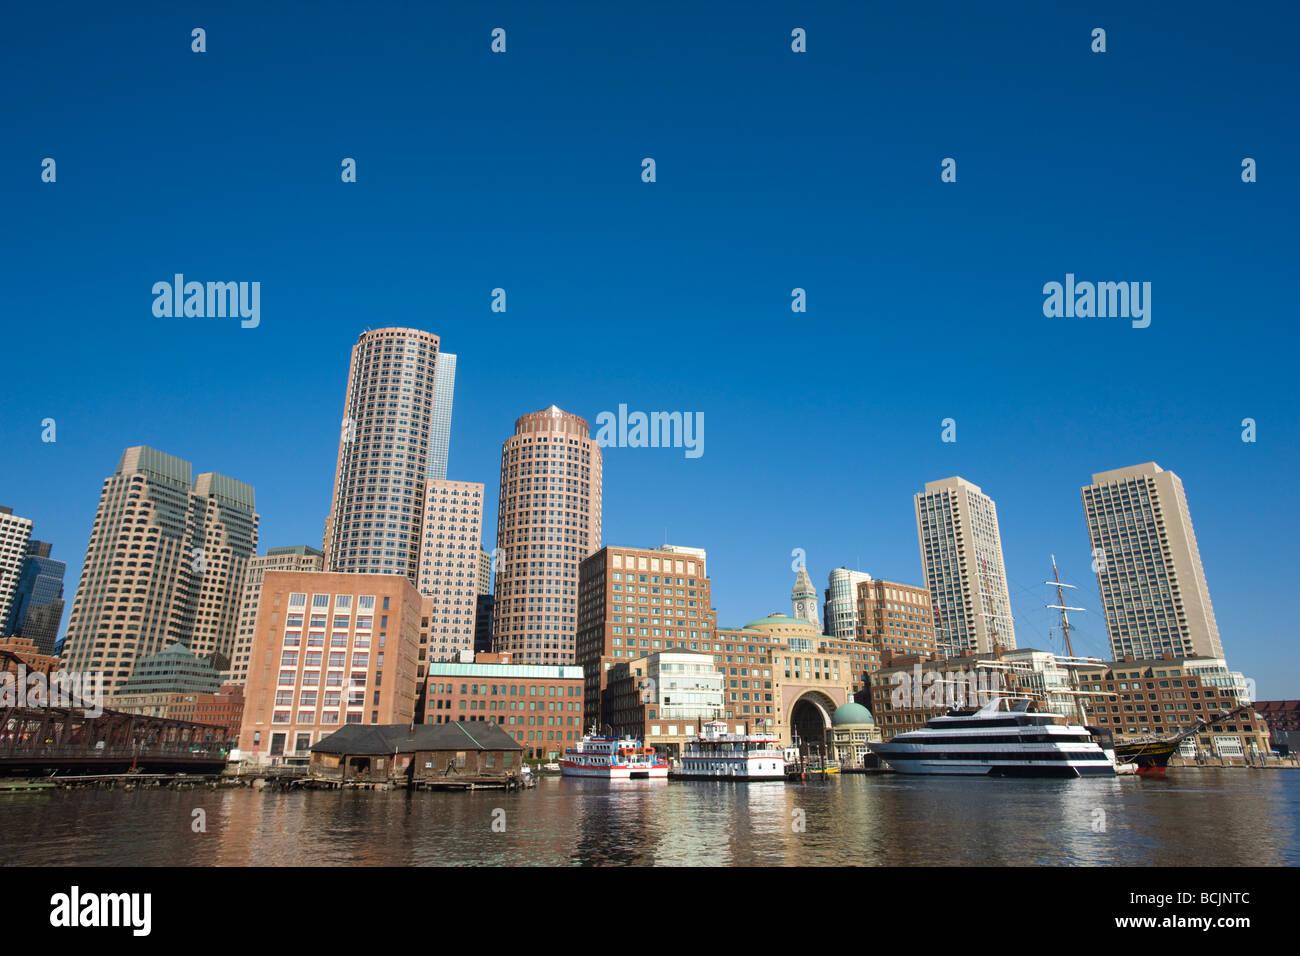 Stati Uniti d'America, Massachusetts, Boston, Rowe's Wharf Immagini Stock